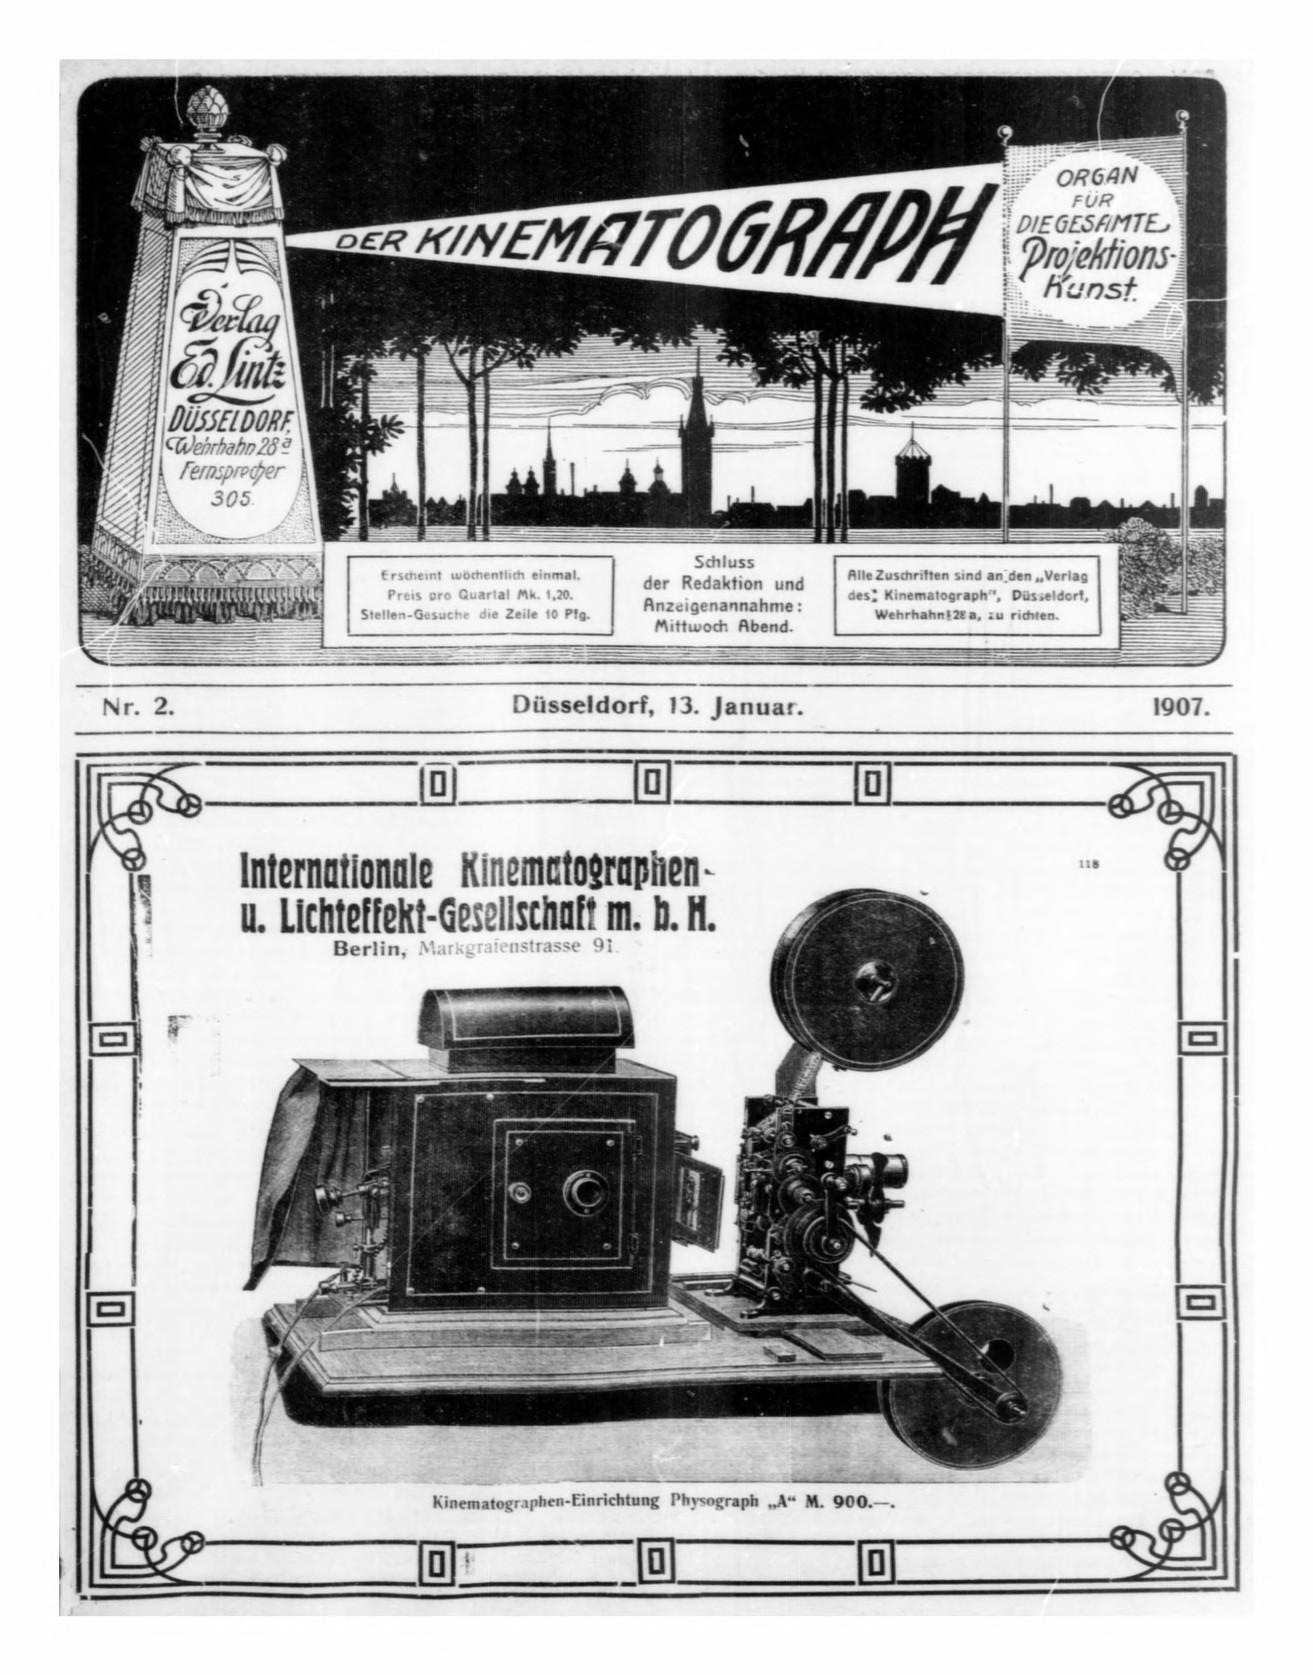 Kinematograph01-1907-01_jp2.zip&file=kinematograph01-1907-01_jp2%2fkinematograph01-1907-01_0012